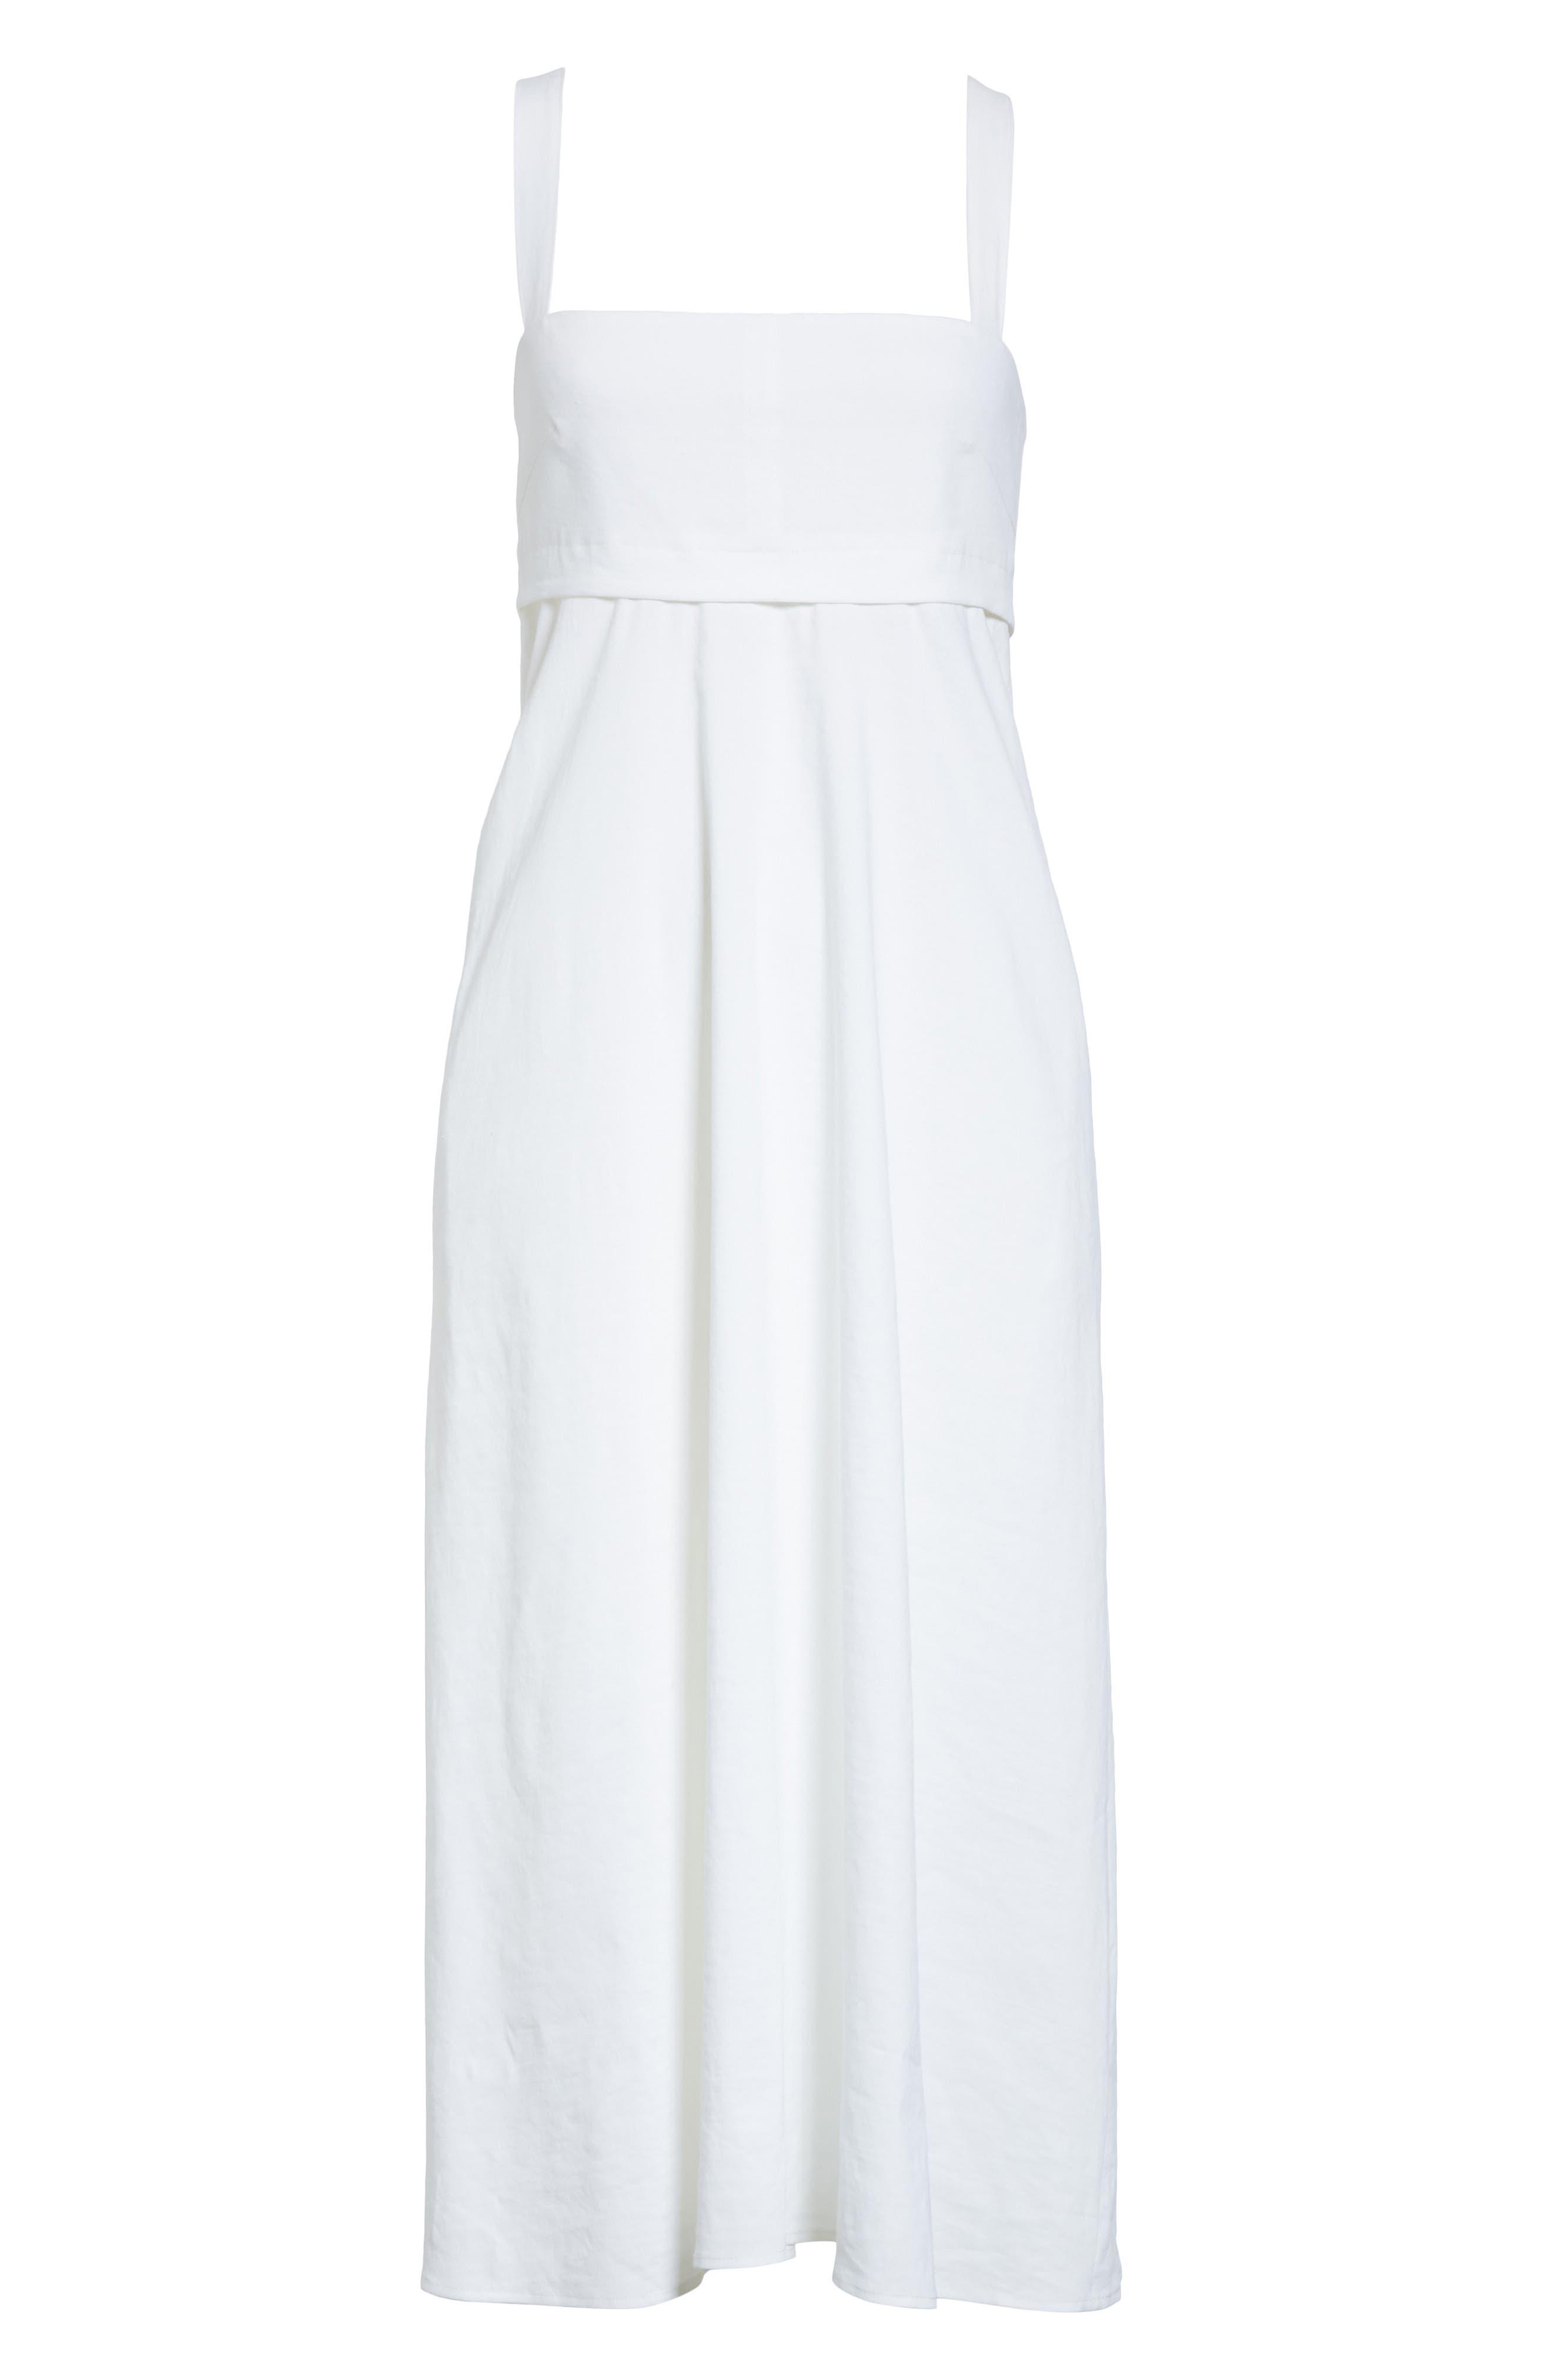 Empire Waist Midi Dress,                             Alternate thumbnail 6, color,                             White